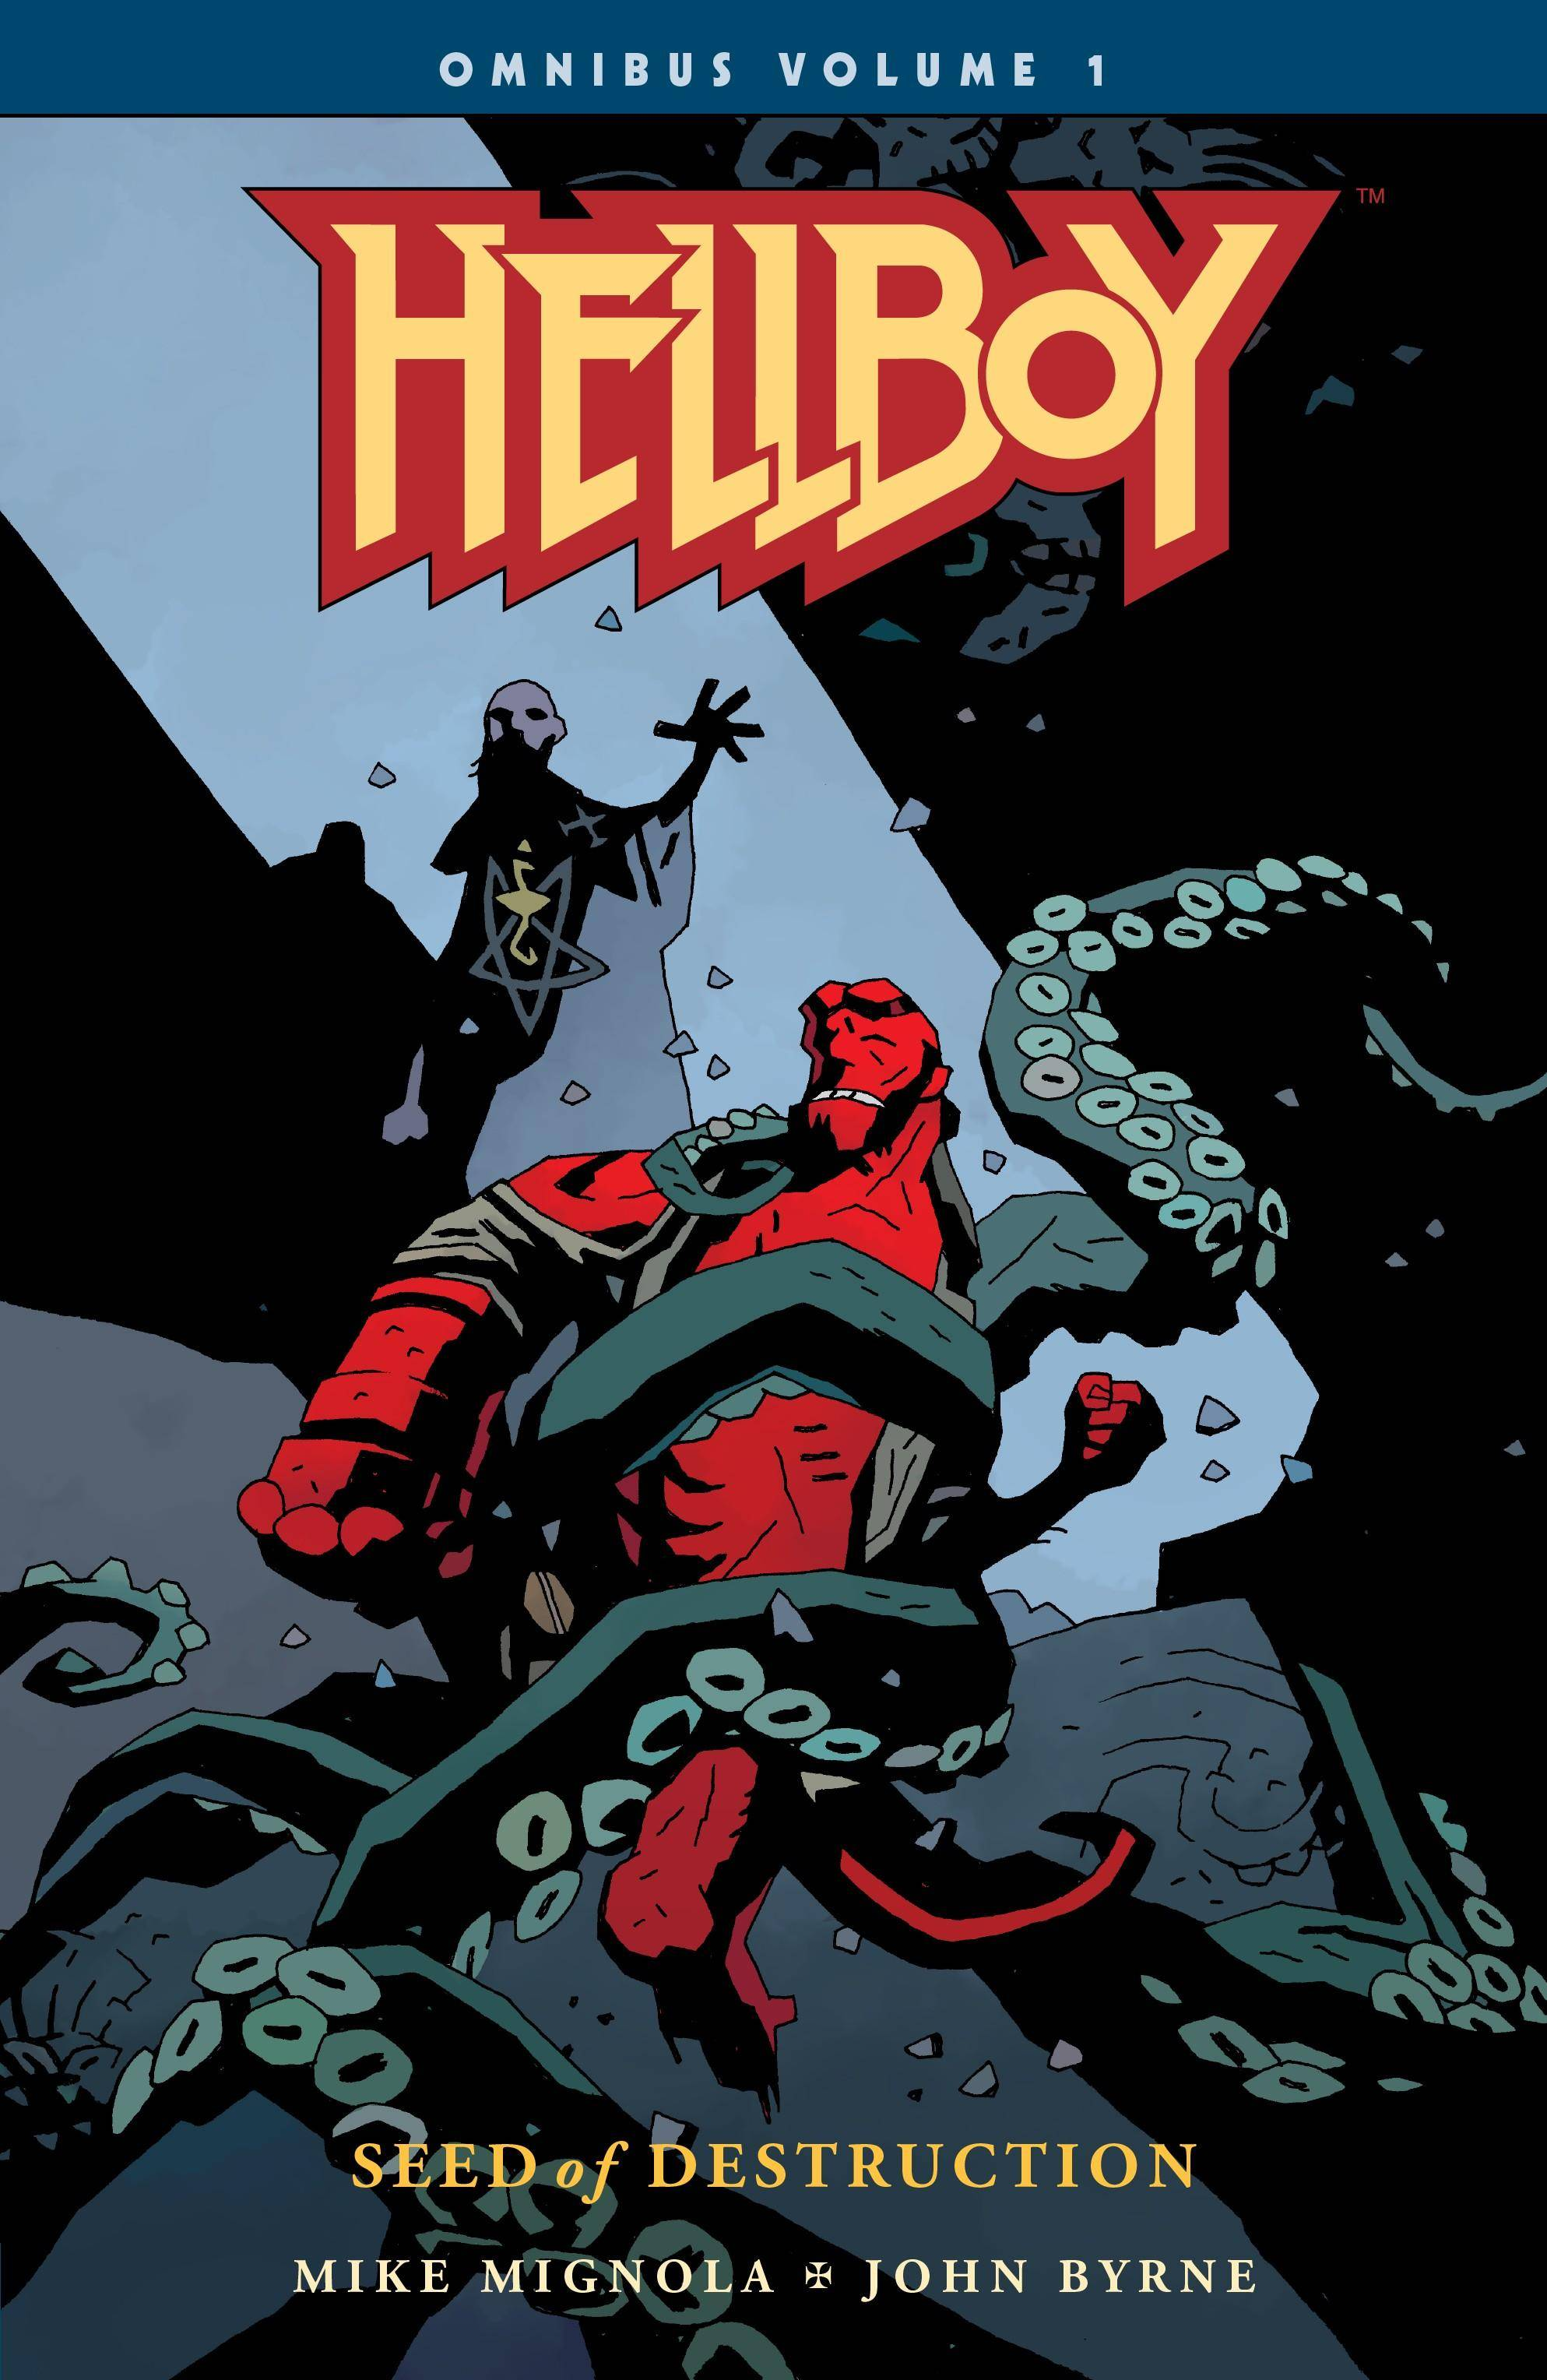 Hellboy.Omnibus.v01-Seed.of.Destruction.2018.digital.Son.of.Ultron-Empire